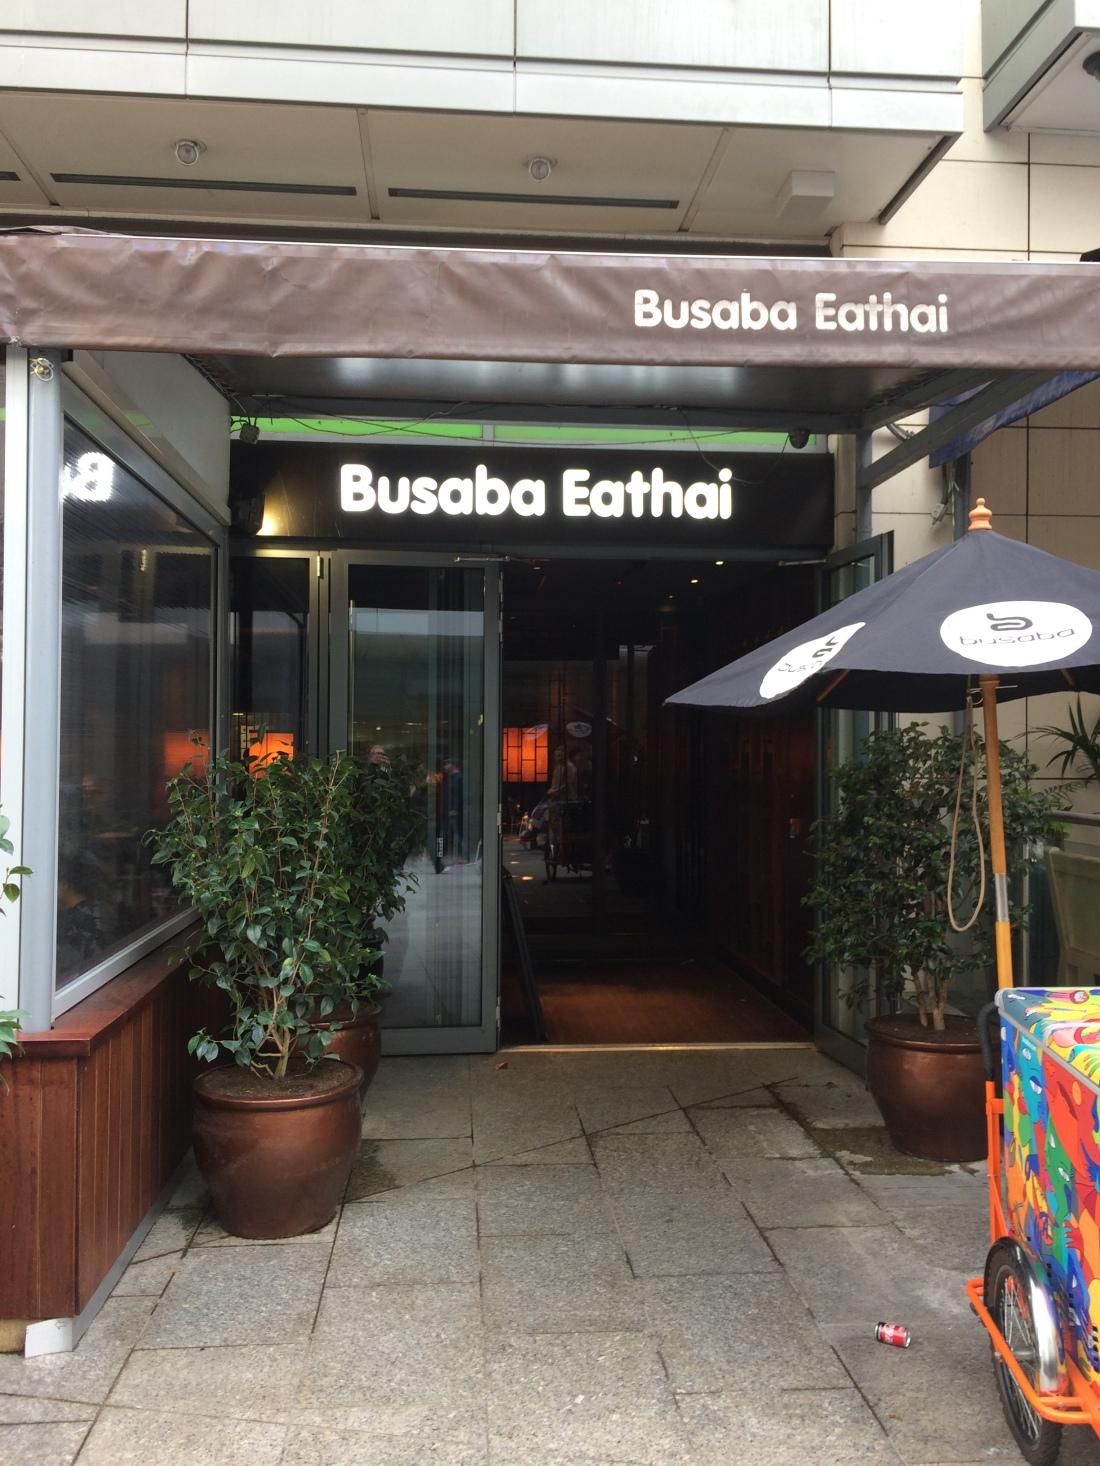 Busaba-Eathai-